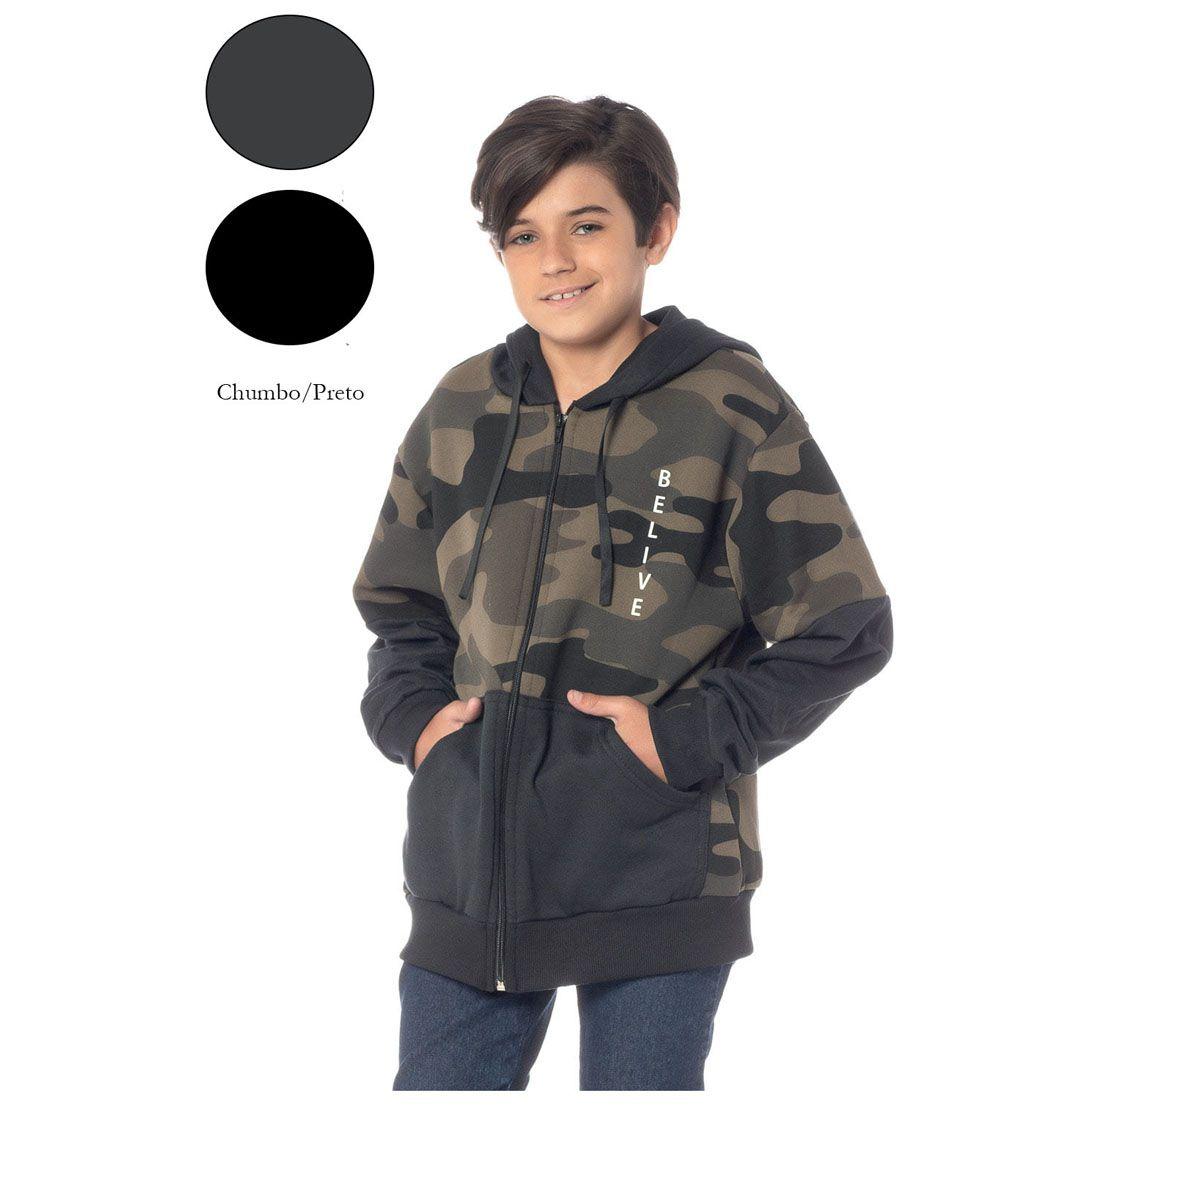 Blusa De Moletom Camuflada Infantil Masculina 16035